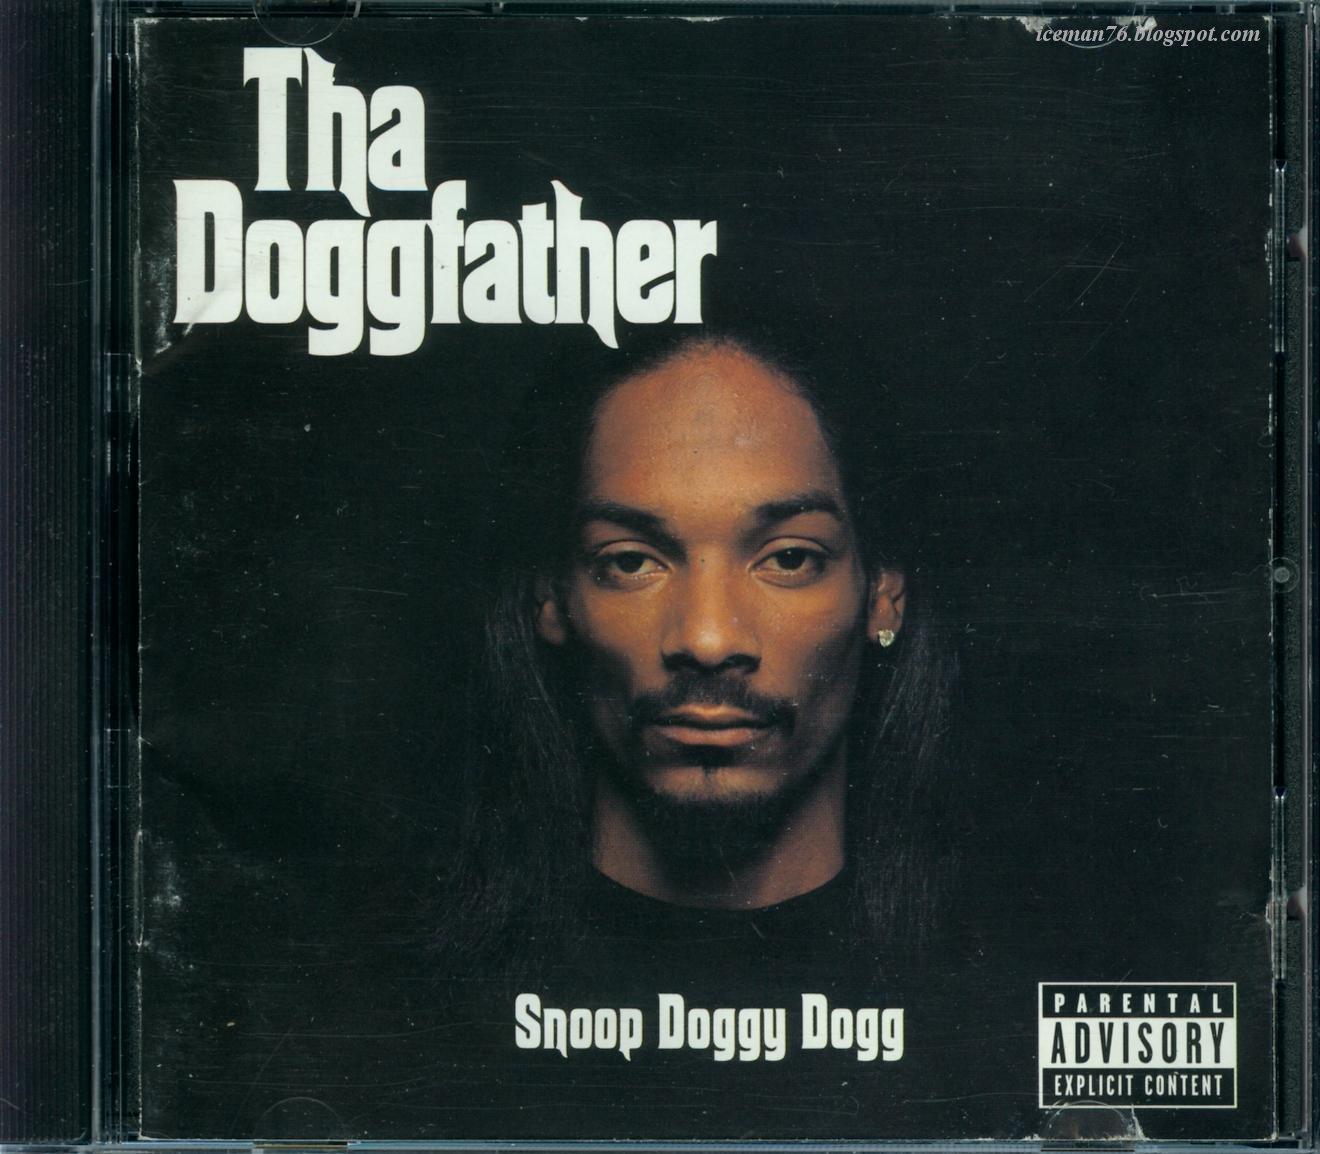 http://1.bp.blogspot.com/_hXDdVNIOzGc/TR77-djXdUI/AAAAAAAABIs/nrD0DMJyD_Y/s1600/snoop%252Bdoggy%252Bdogg%252B-%252Btha%252Bdoggfather.jpg